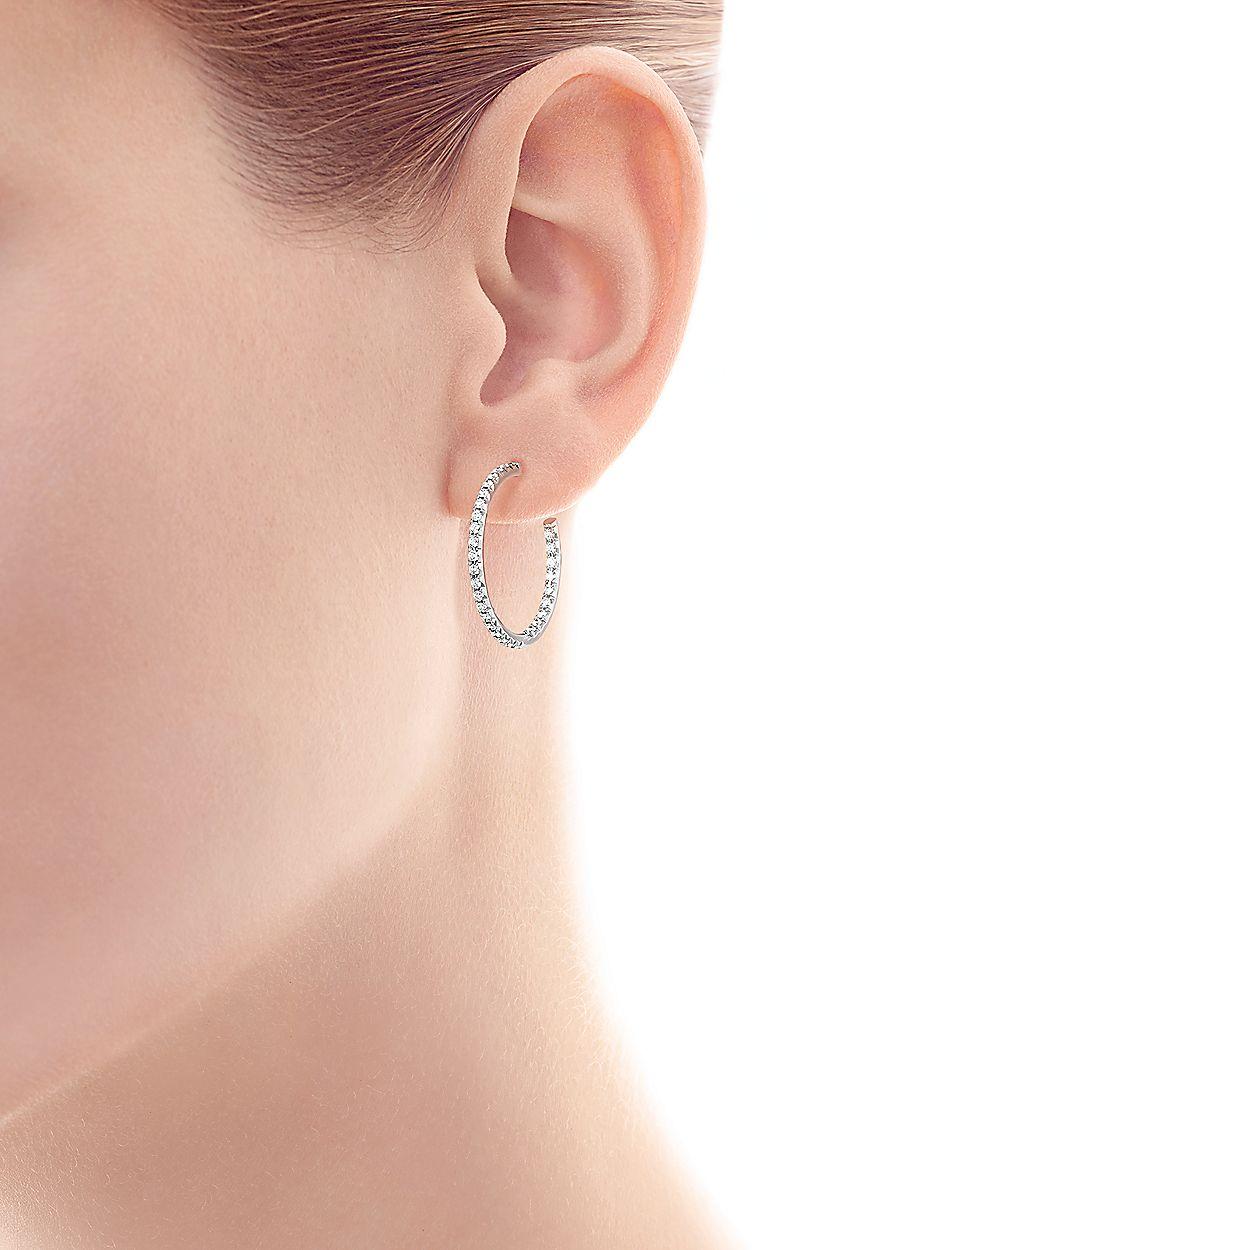 93076a5e0 Tiffany Metro hoop earrings in 18k white gold with diamonds, medium ...